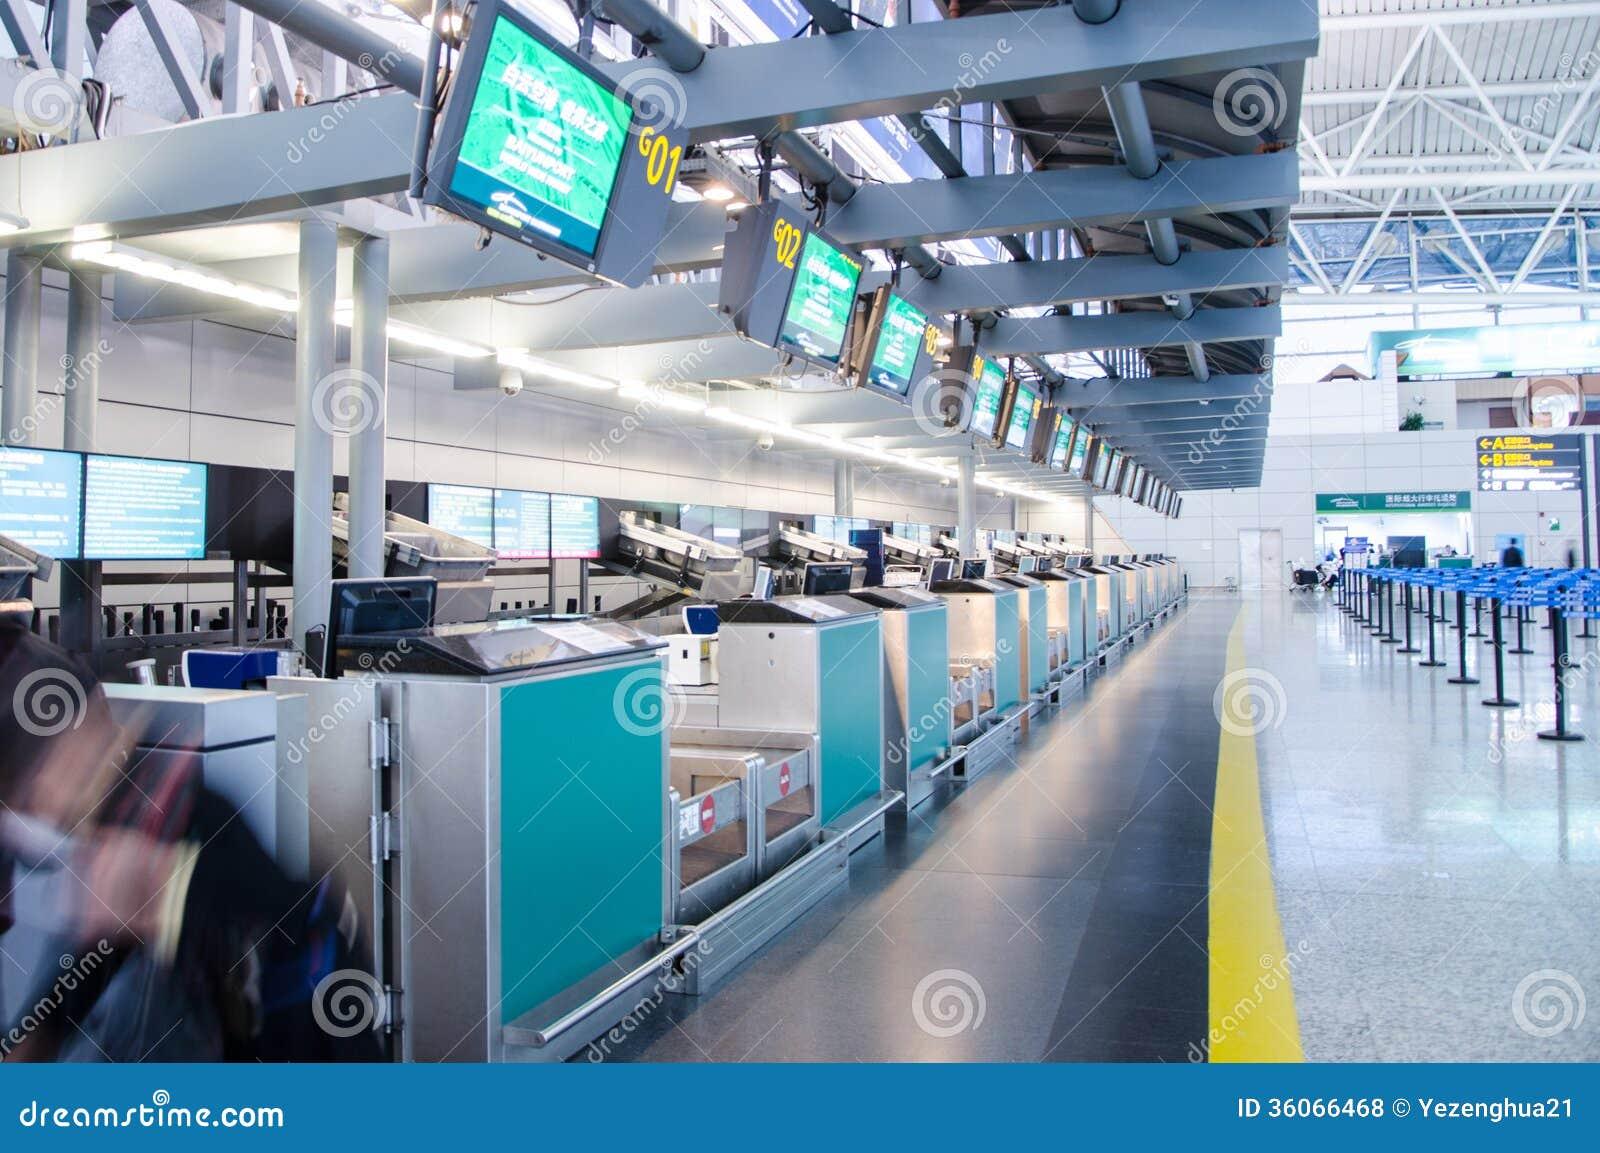 Passengers in guangzhou airport baiyun editorial photo - China southern airlines guangzhou office ...